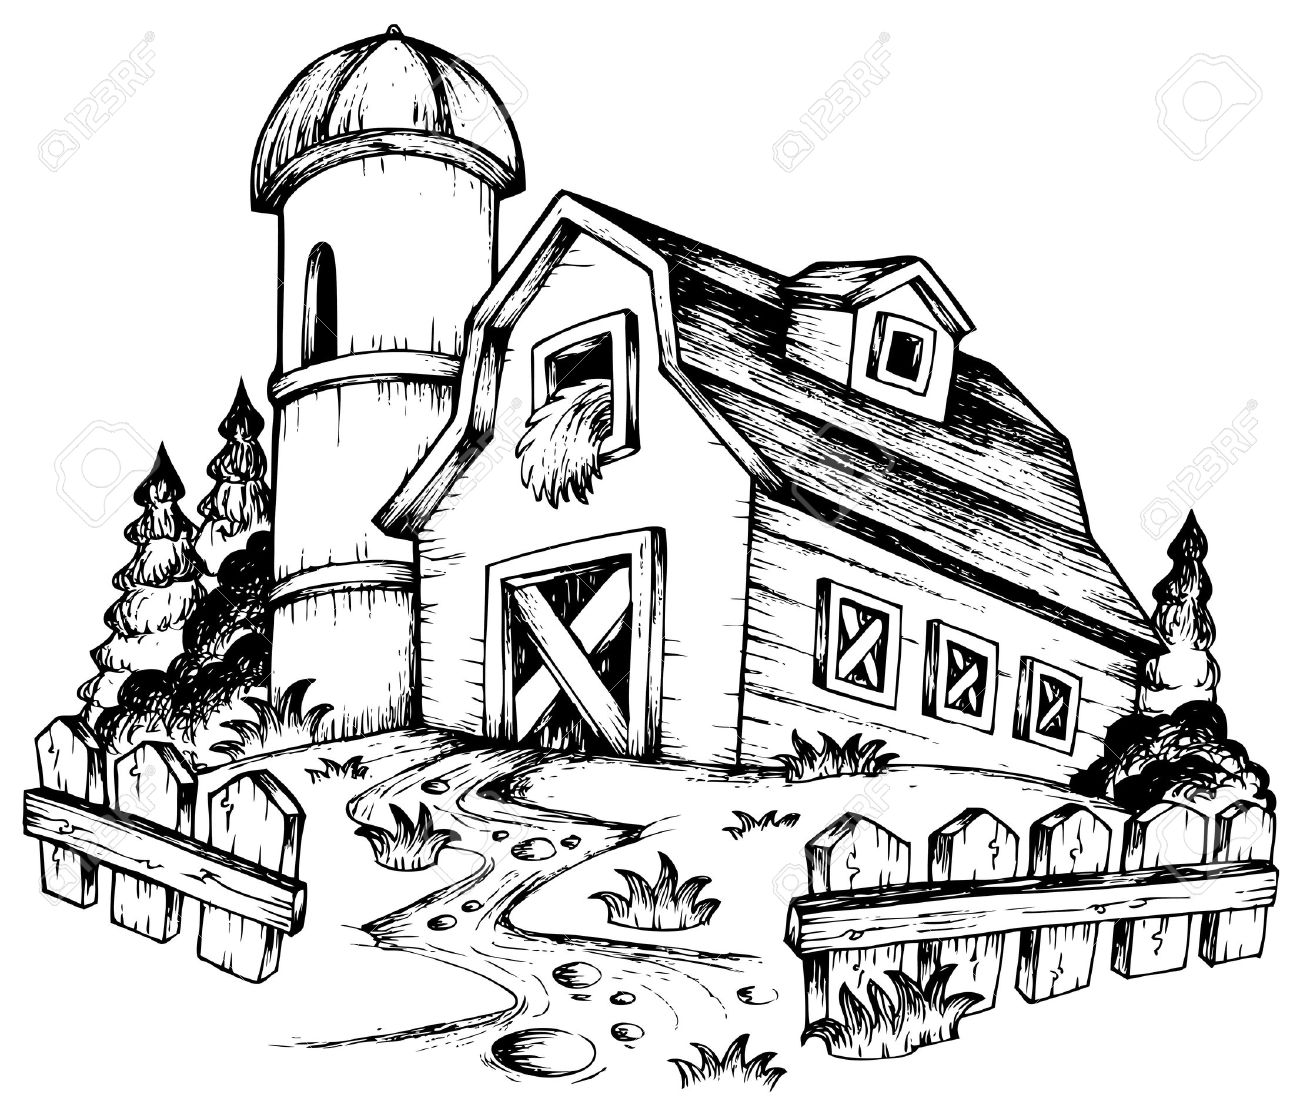 Farm theme drawing illustration. Stock Vector - 11505348